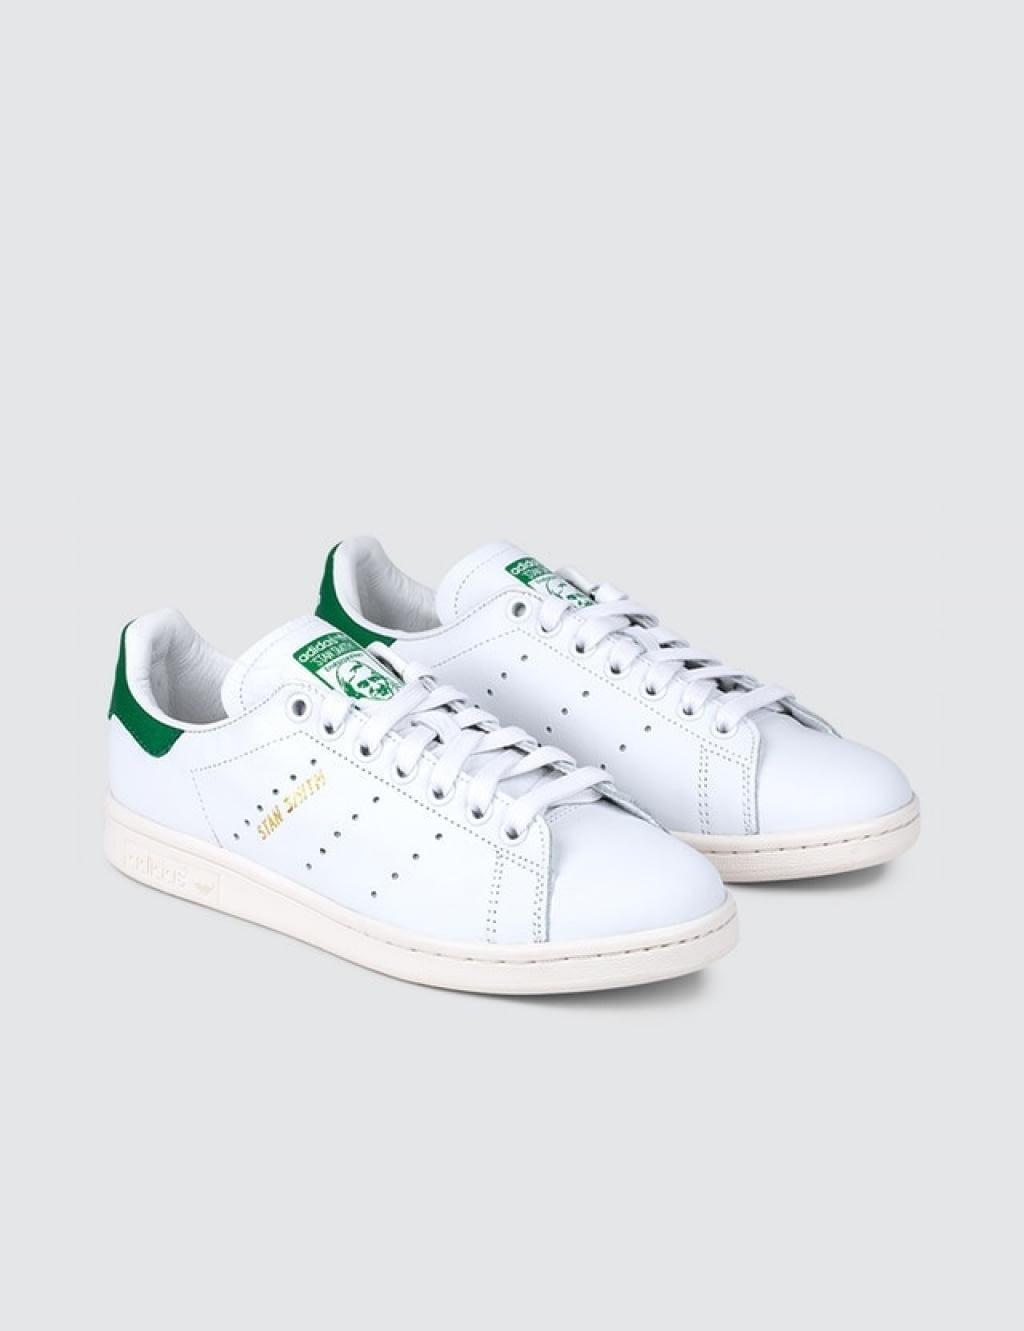 new concept 11b65 45ff6 ... italy adidas originals stan smith 0b7de 7771d